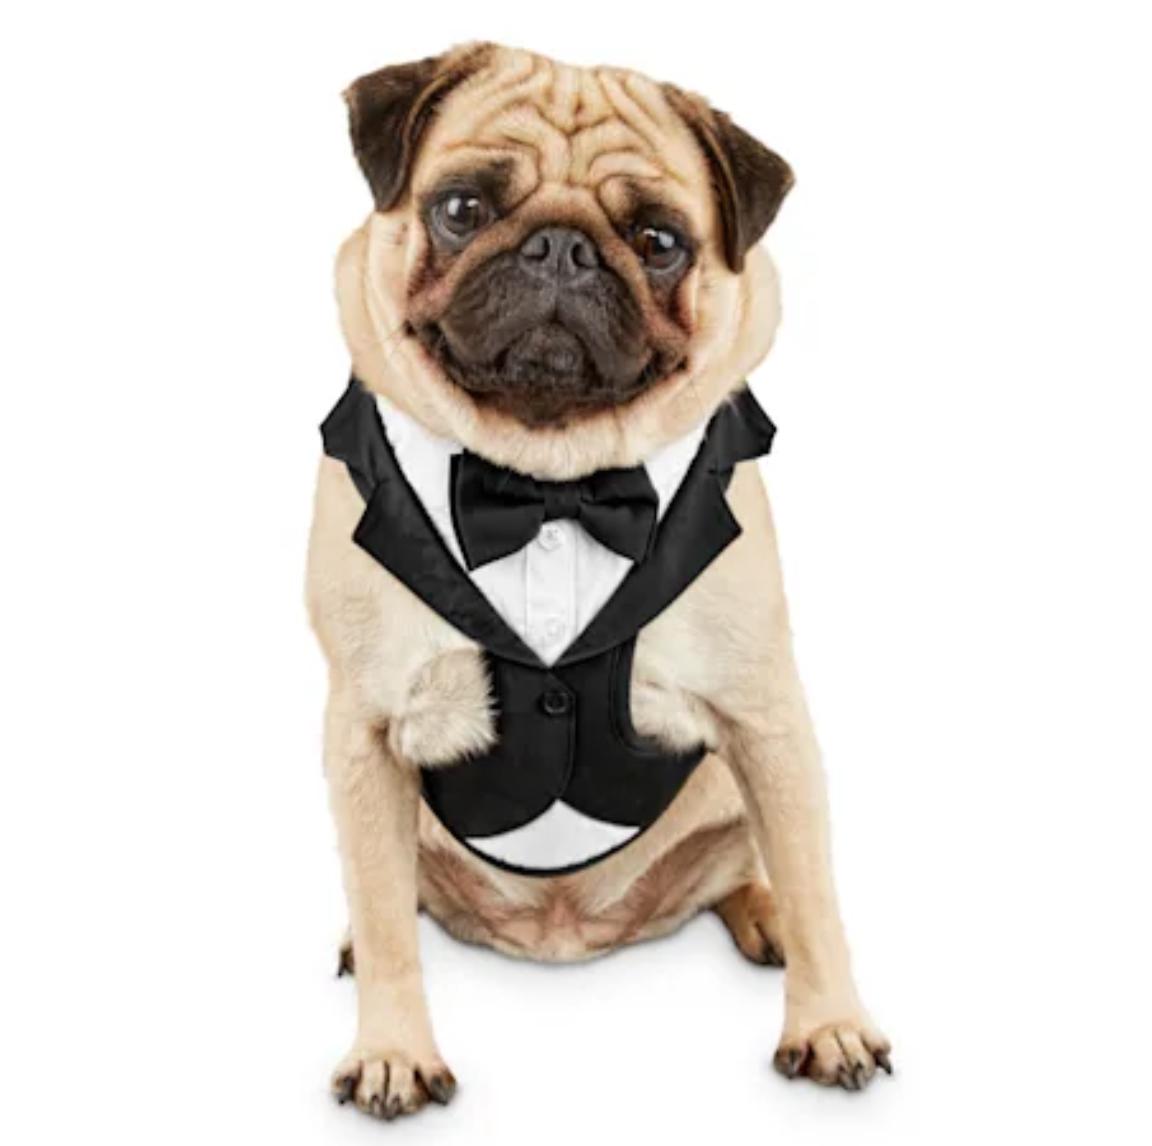 Pug wearing a tuxedo harness